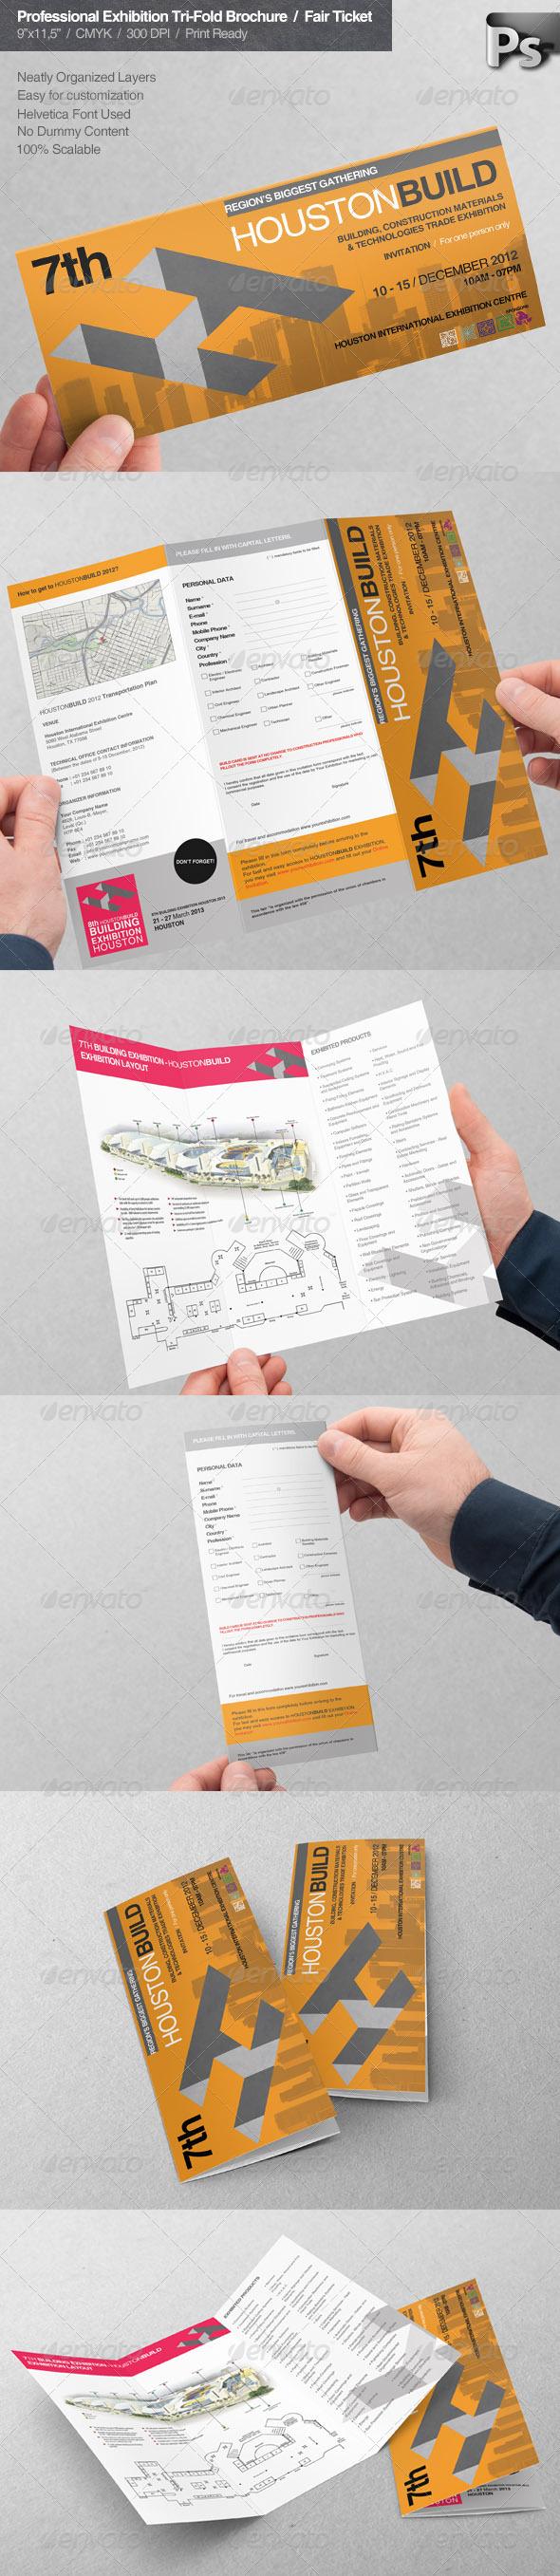 Professional Exhibition Tri-Fold Brochure / Ticket - Brochures Print Templates